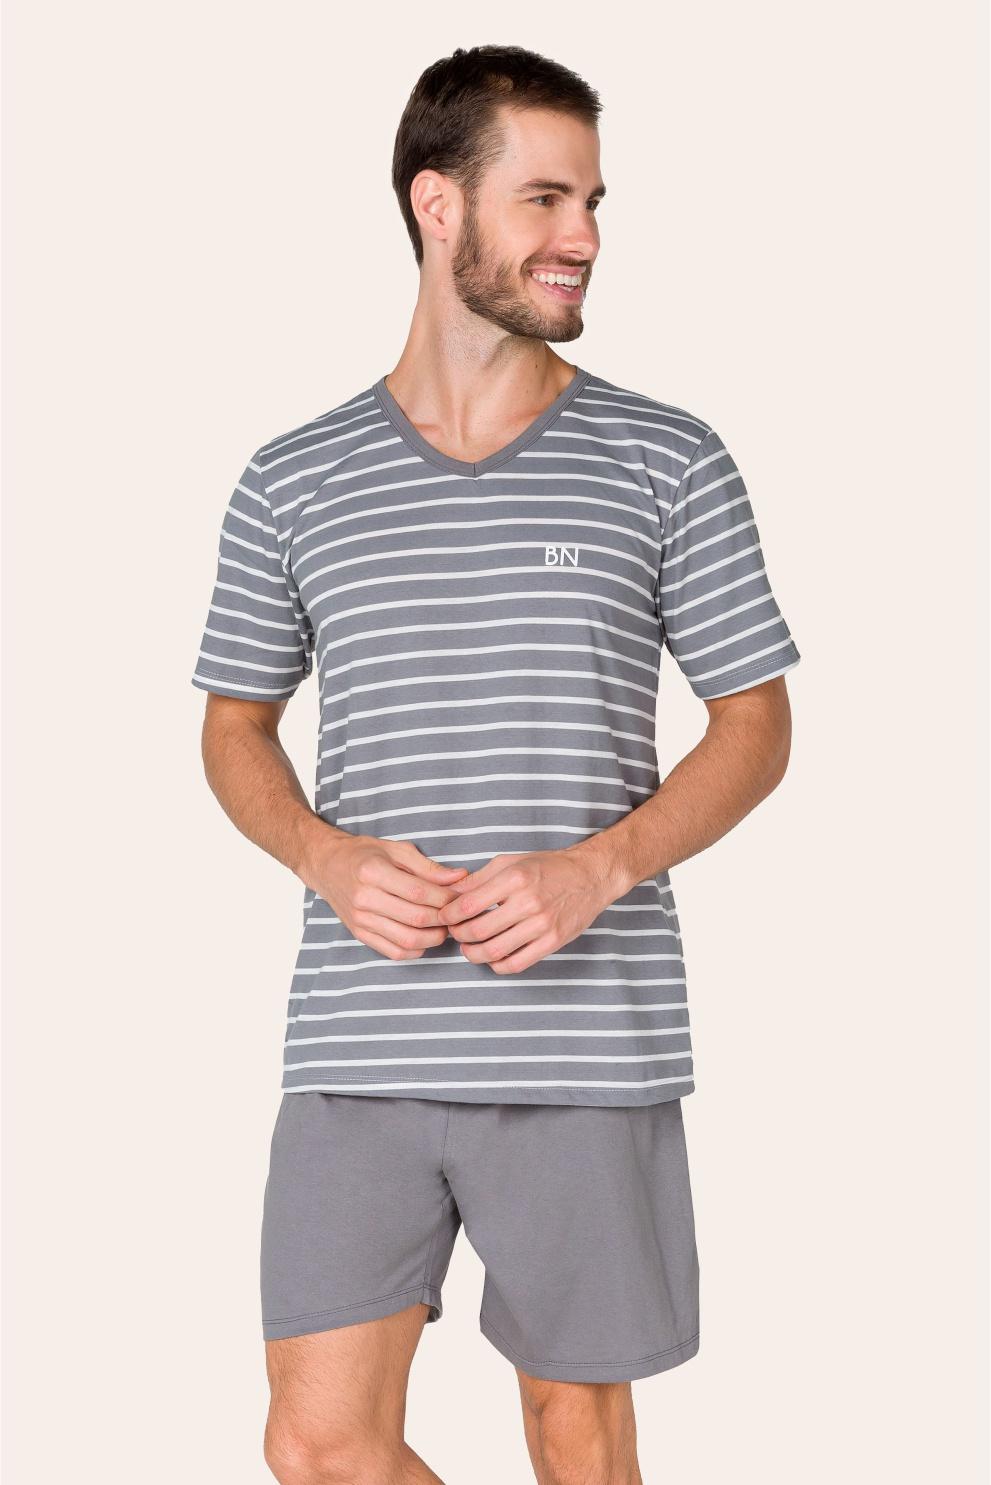 013/B - Pijama Adulto Masculino Listrado